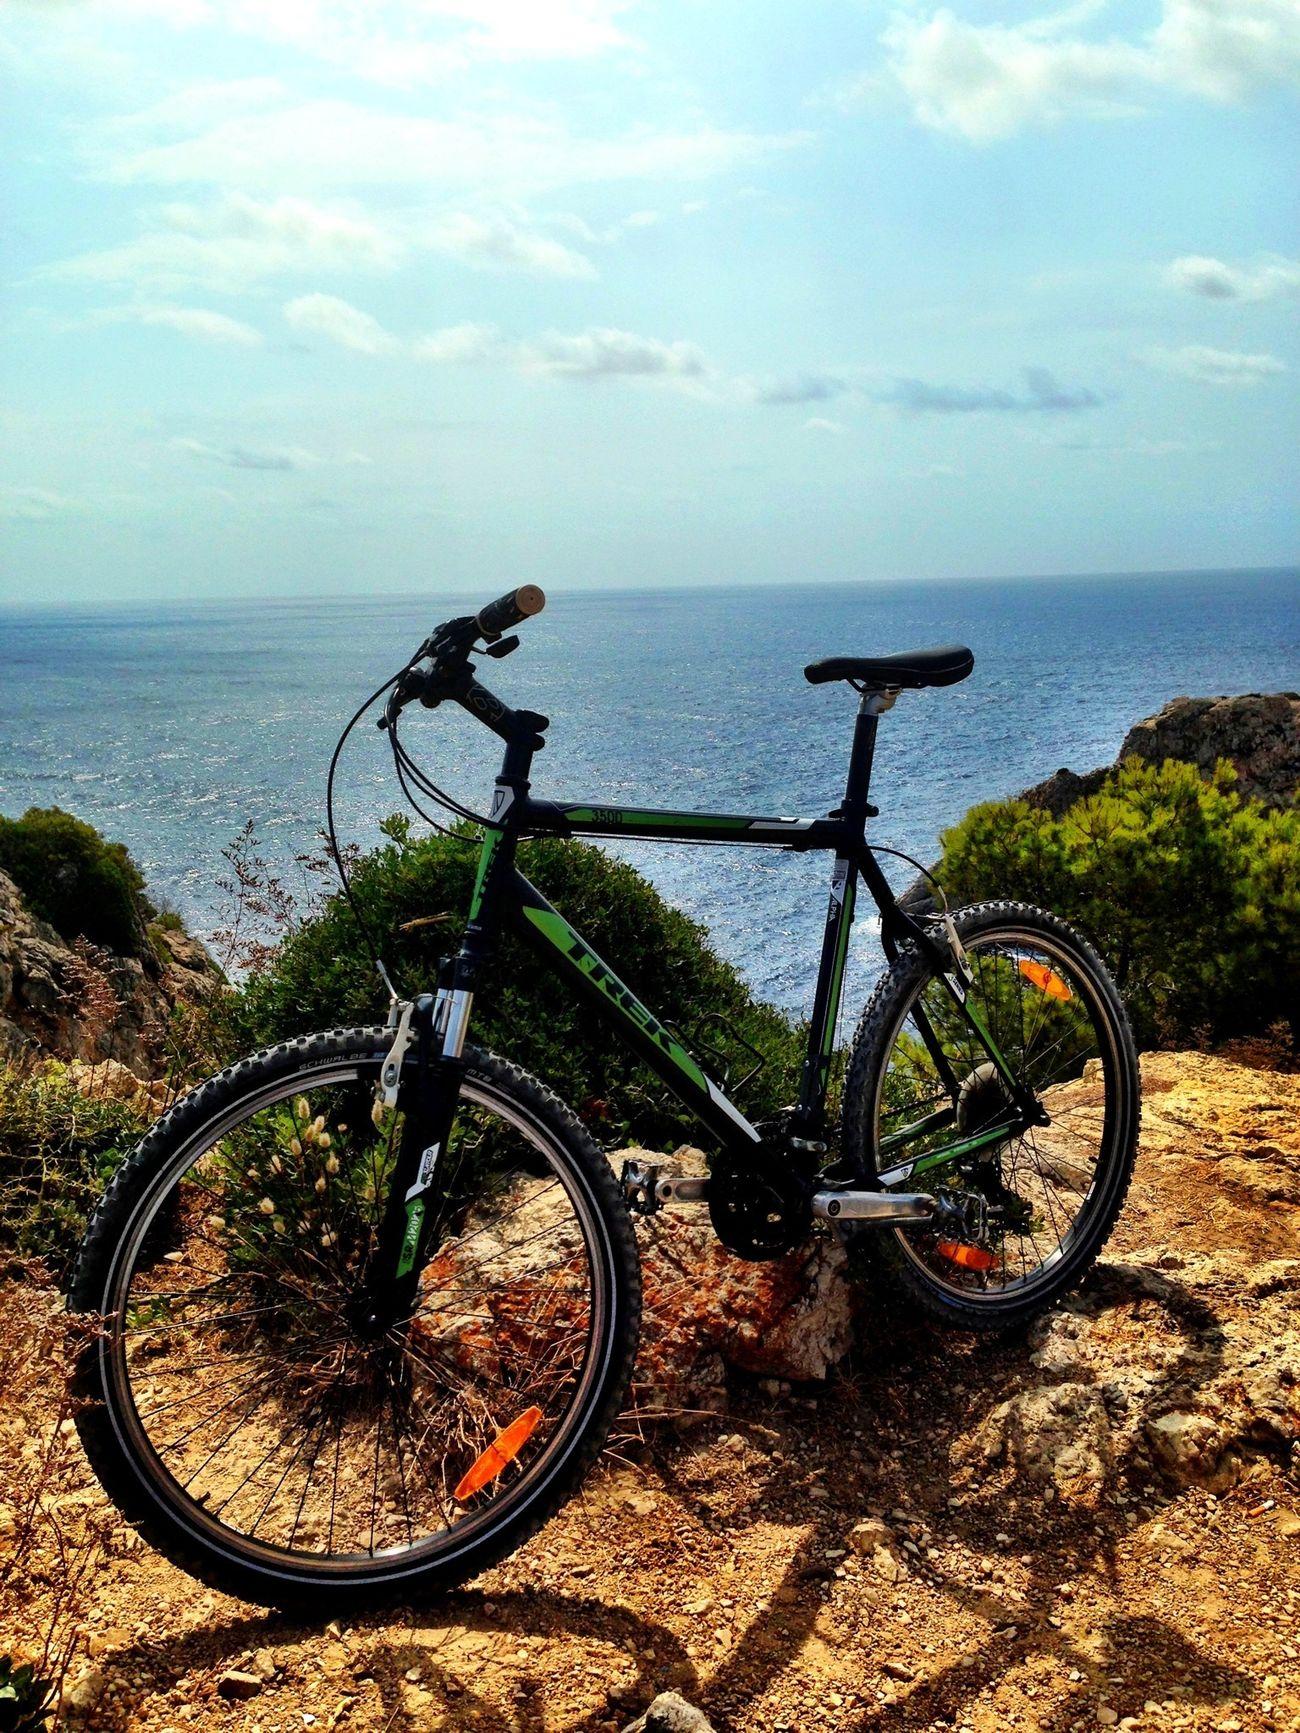 Sunday Trip Riding Bike